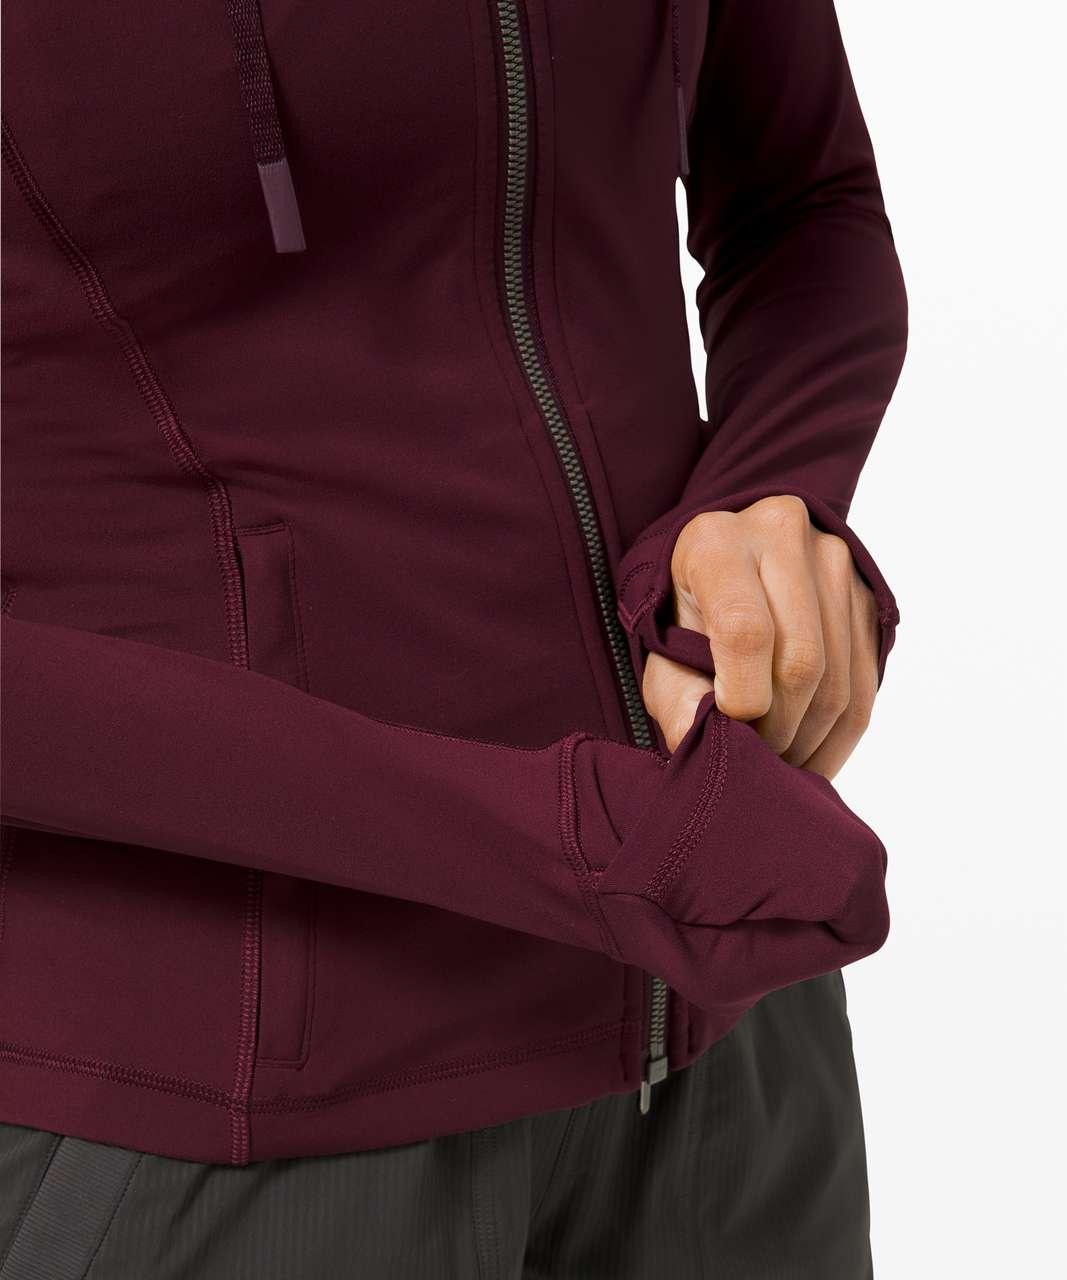 Lululemon Hooded Define Jacket *Nulu - Cassis (First Release)